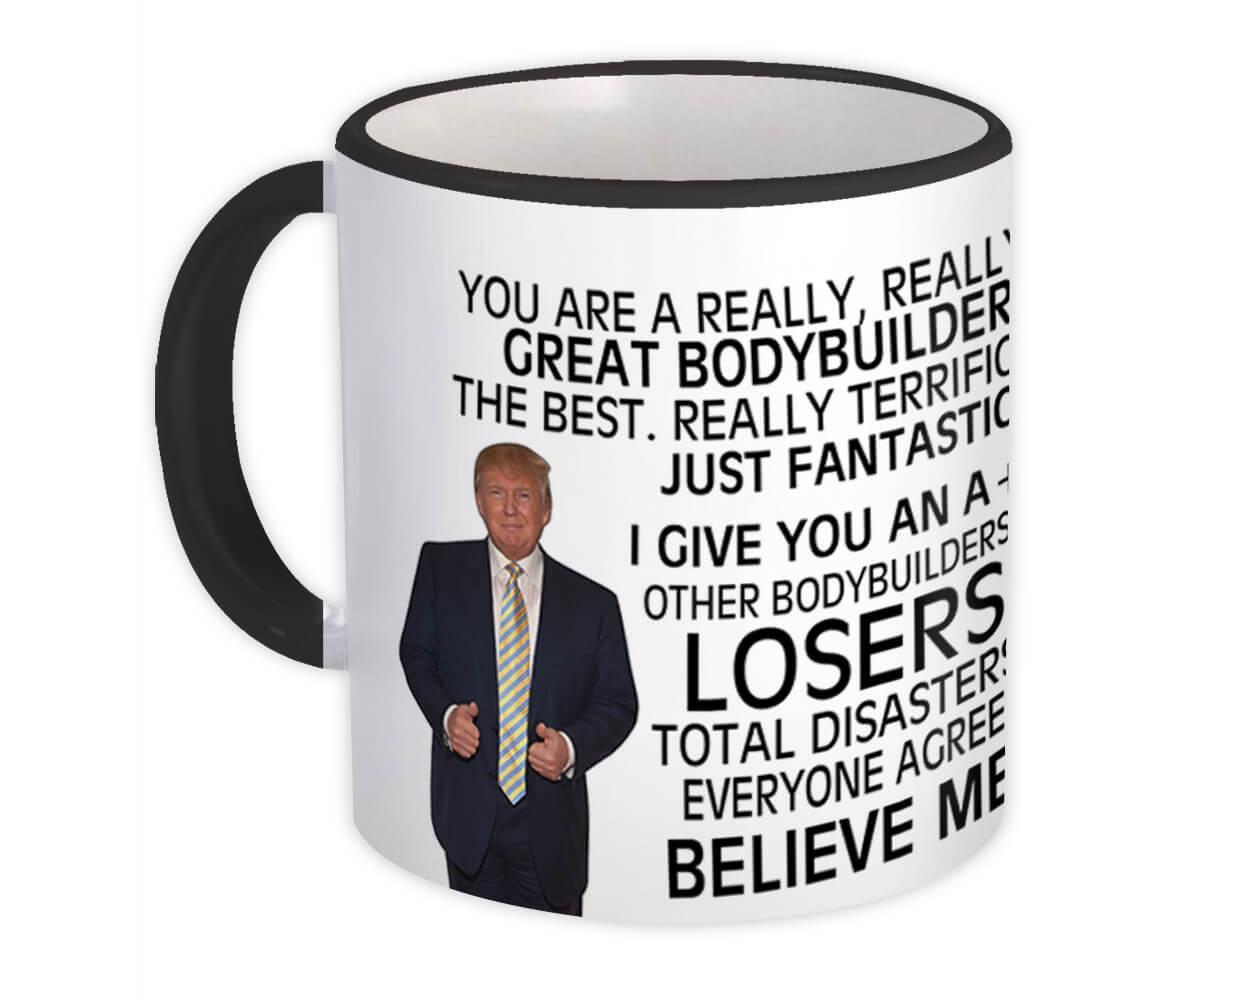 Gift for Bodybuilder : Gift Mug Donald Trump Great Bodybuilder Funny Christmas